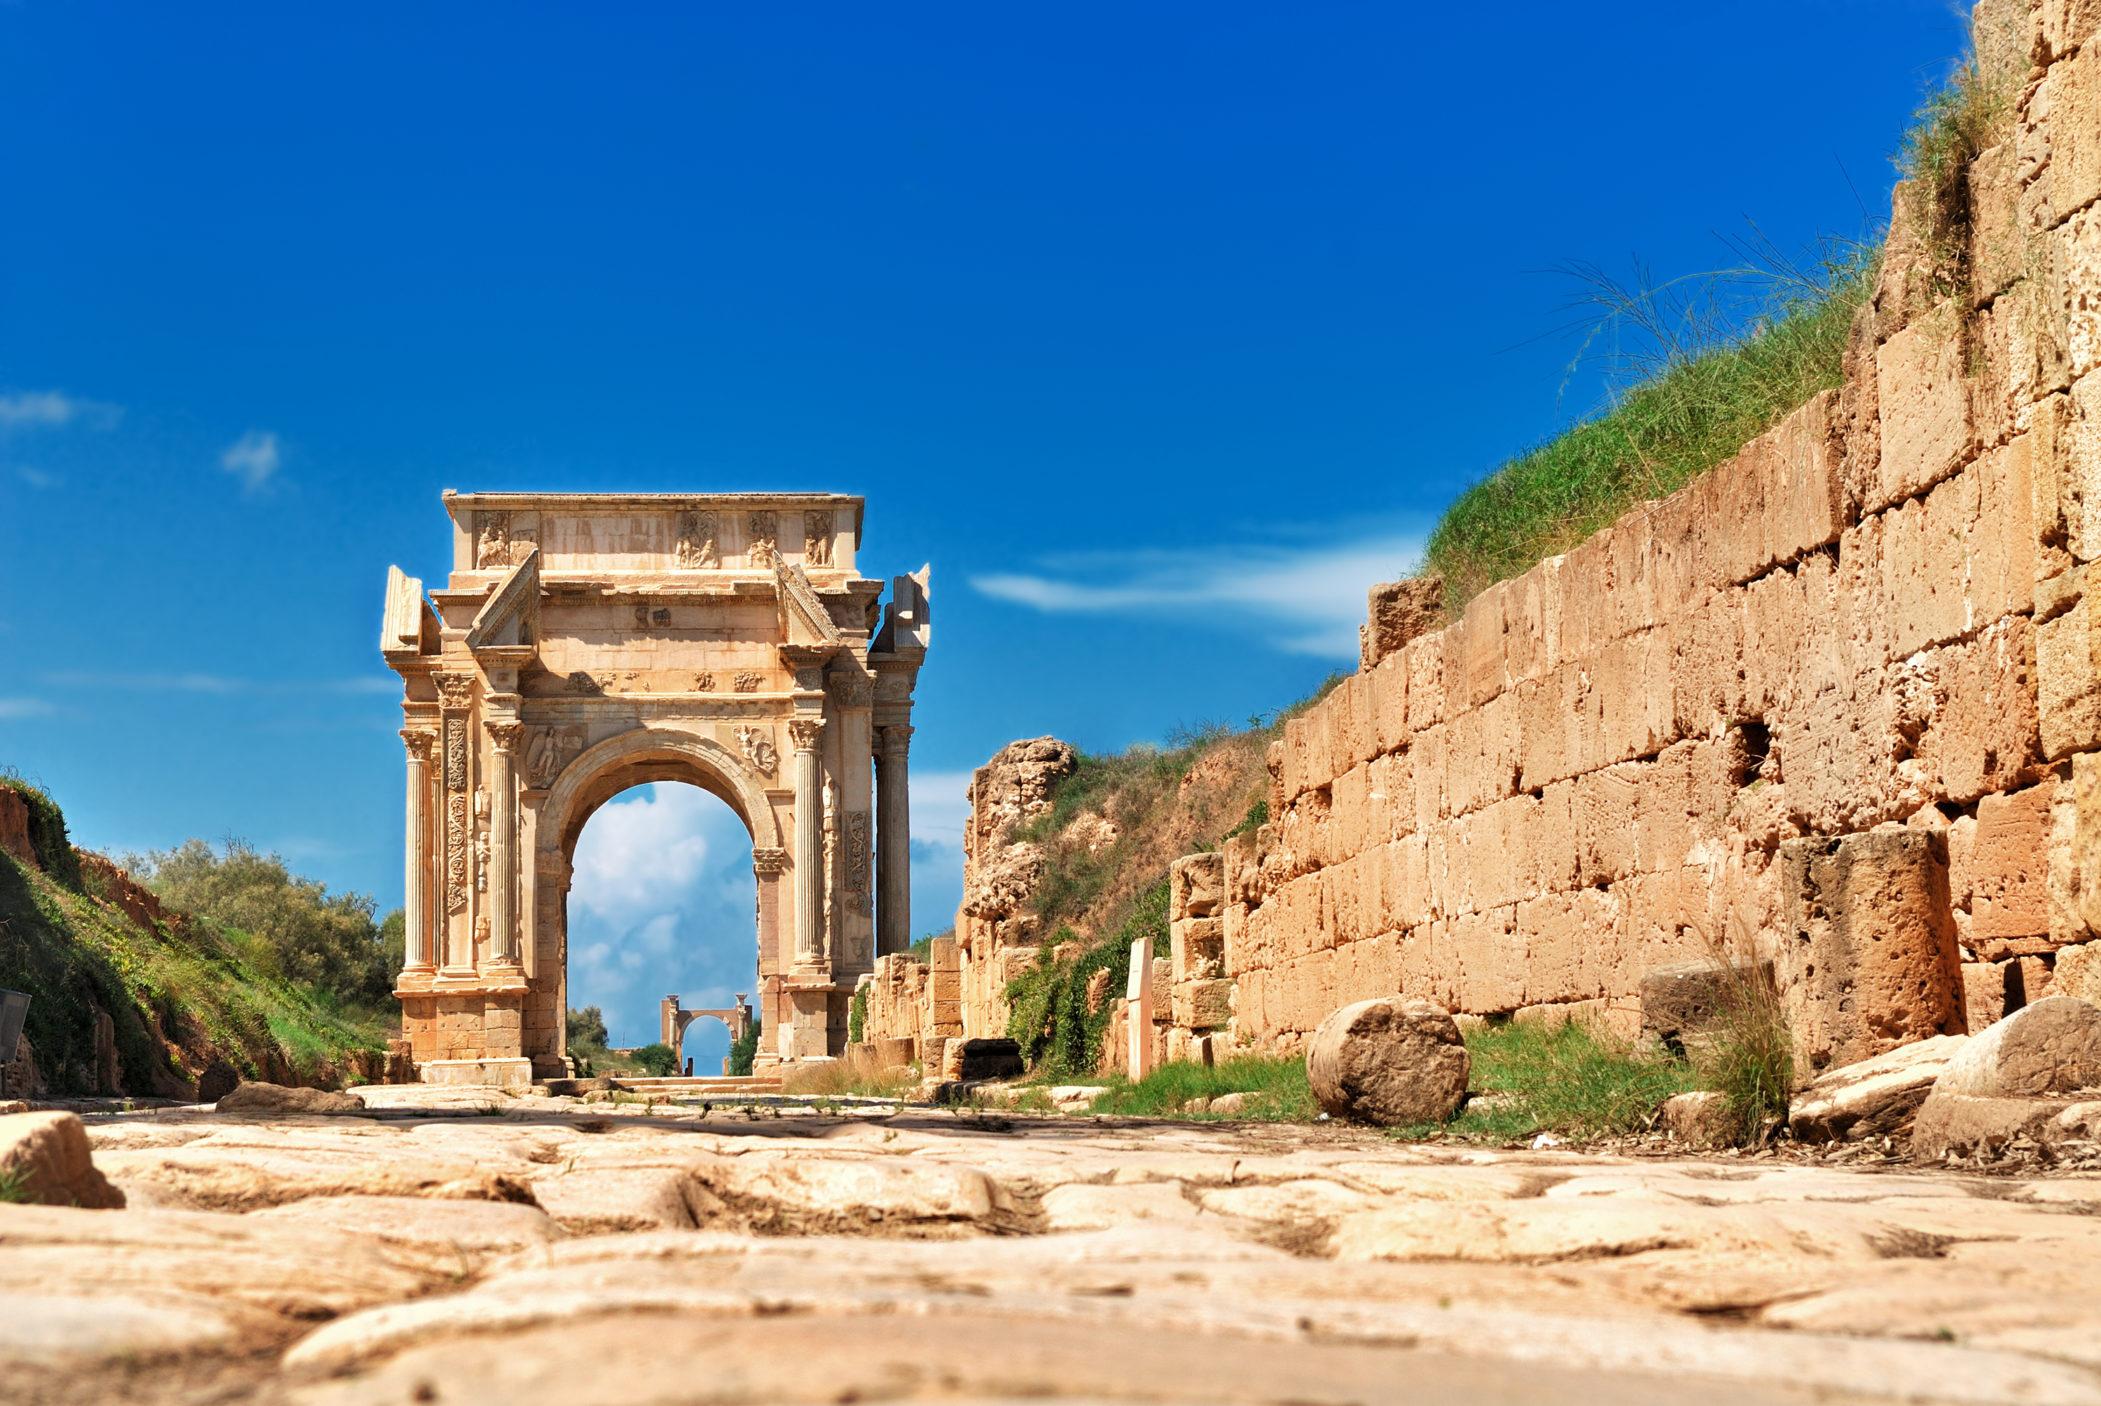 Libya [Shutterstock]